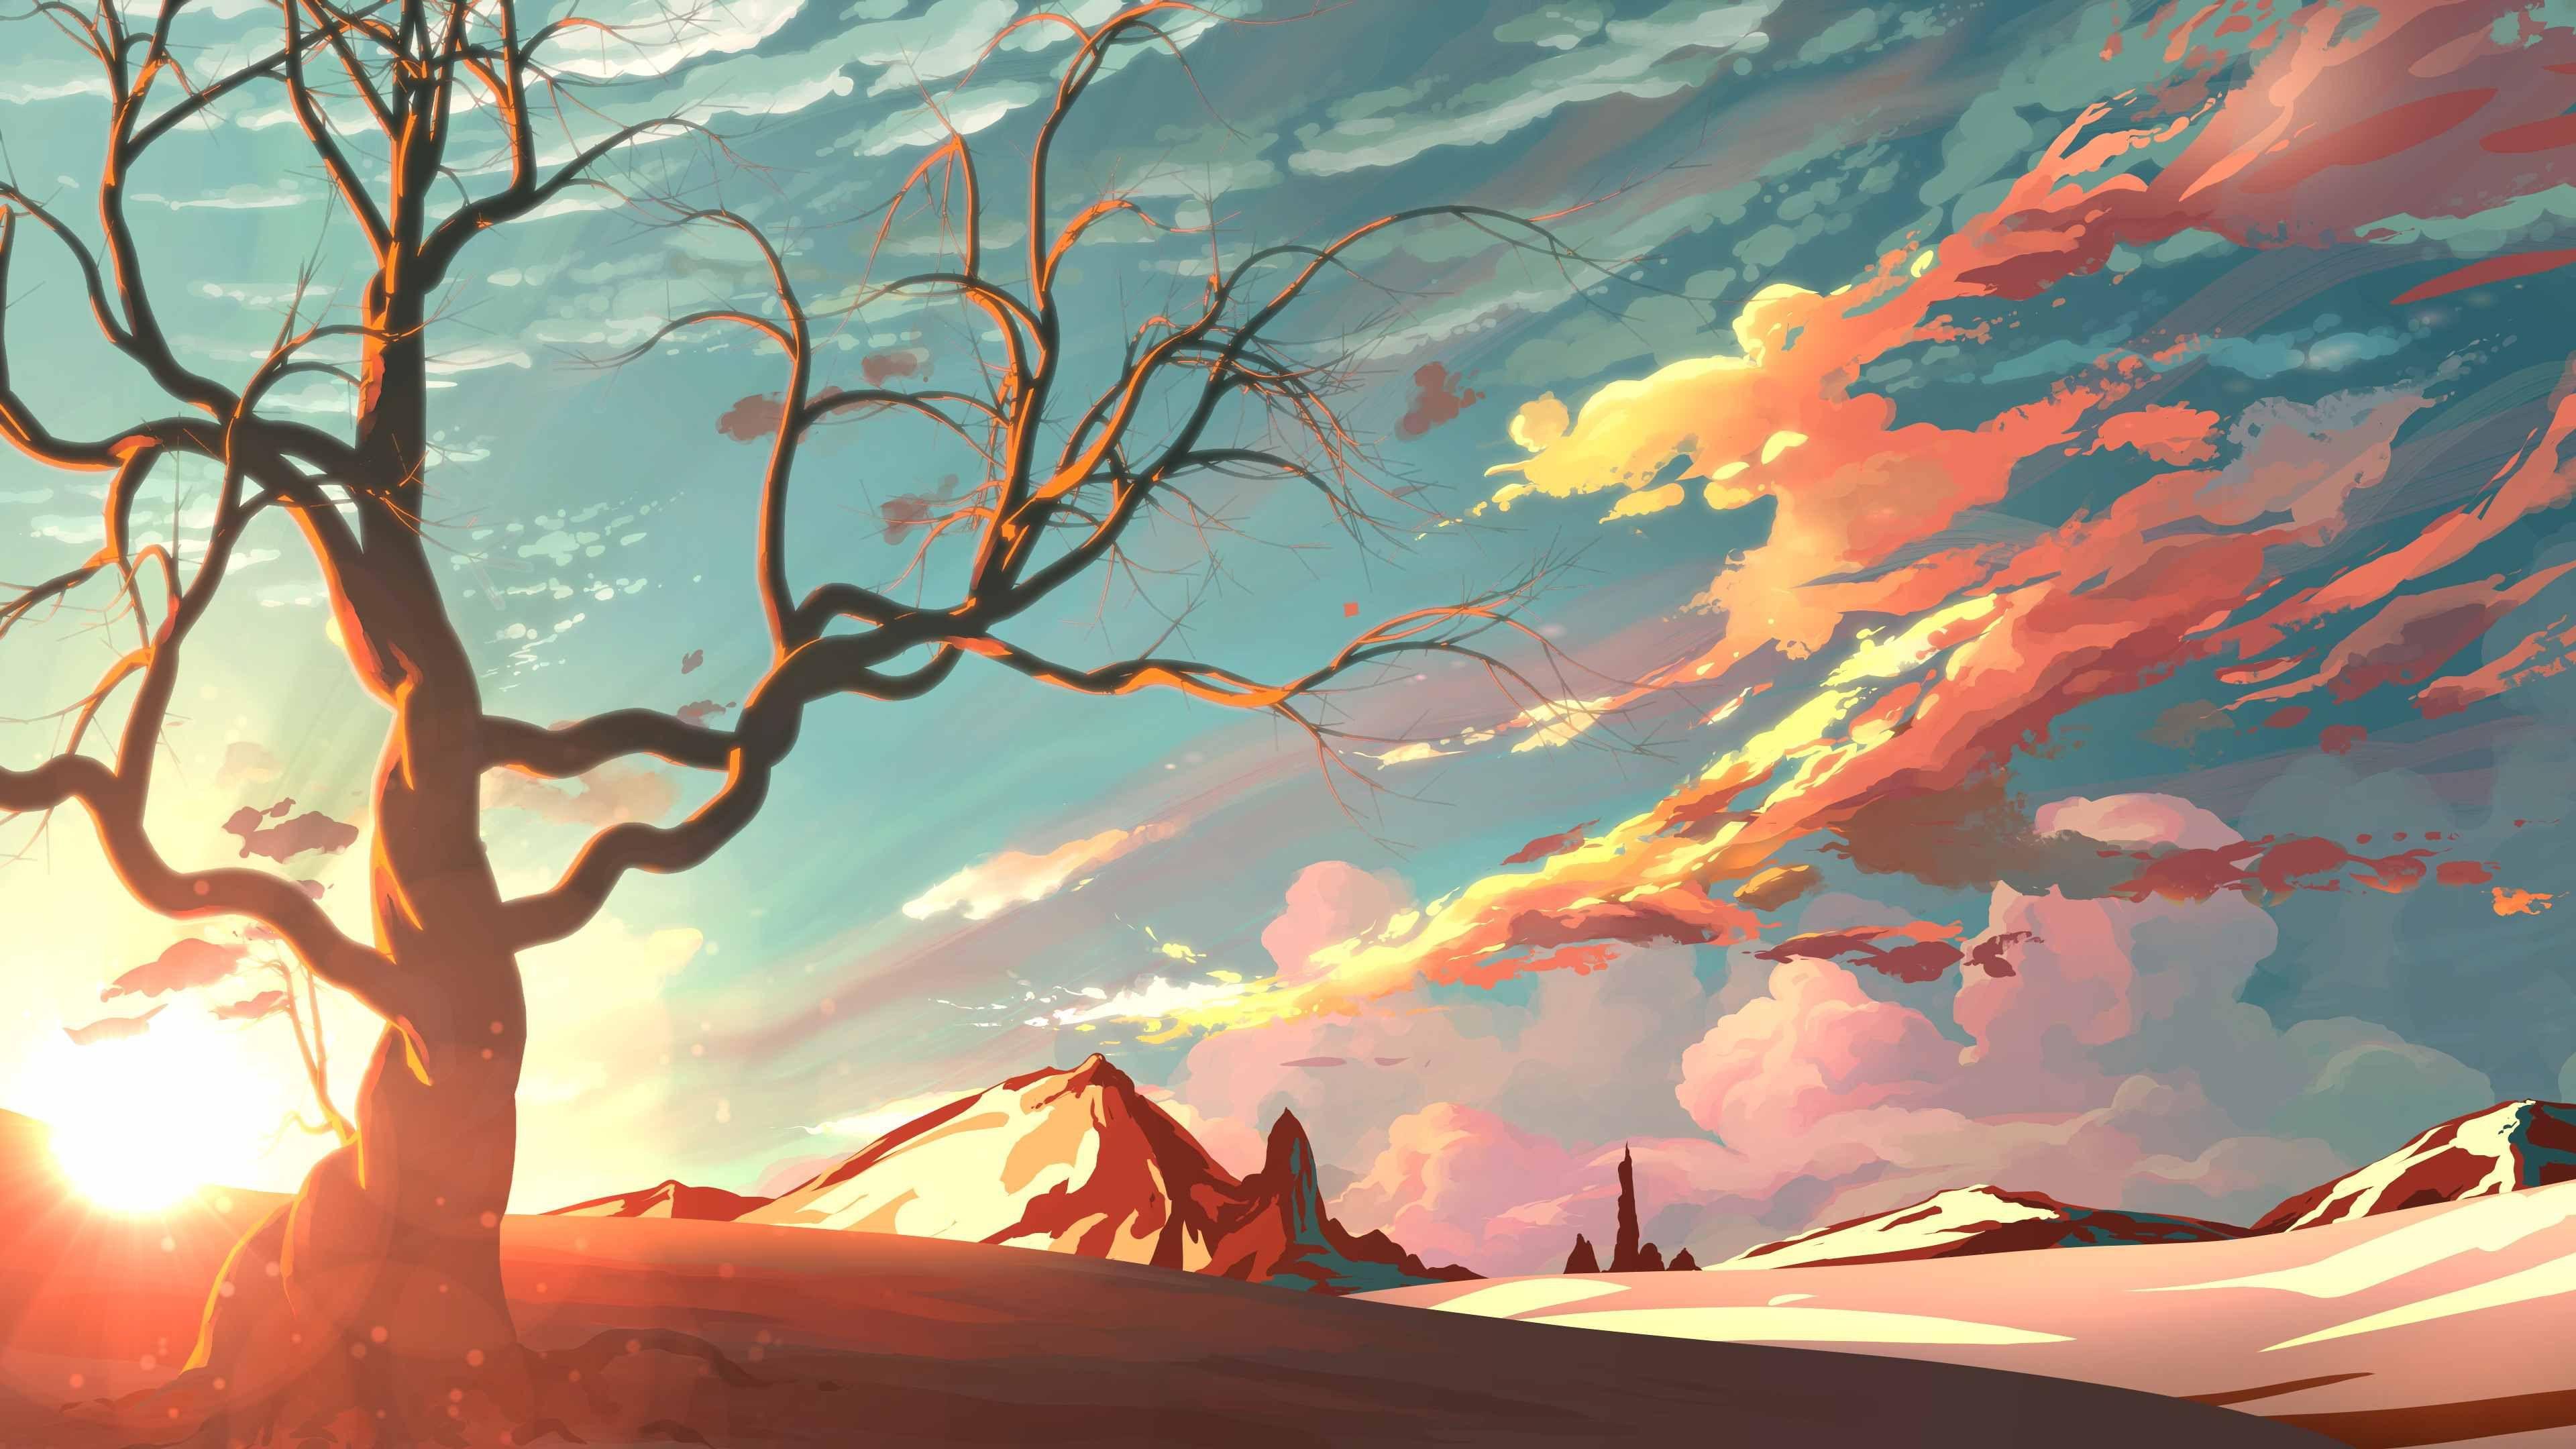 Ultra Hd Wallpapers 8k Resolution 7680 4320 Anime Scenery Wallpaper Scenery Wallpaper Landscape Illustration